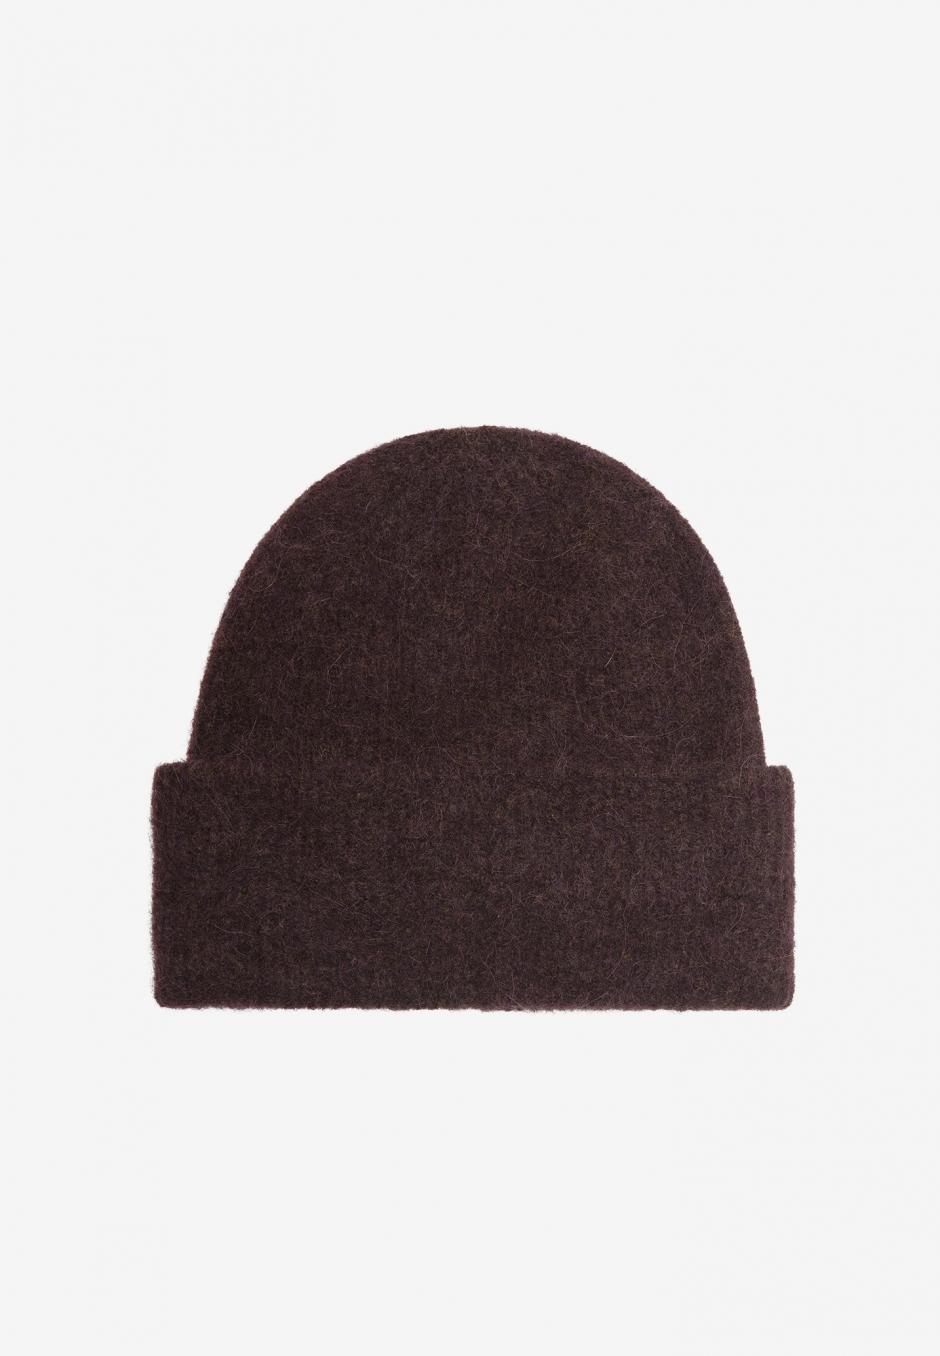 Samsøe Samsøe Nor Hat Chocolate Plum Melange